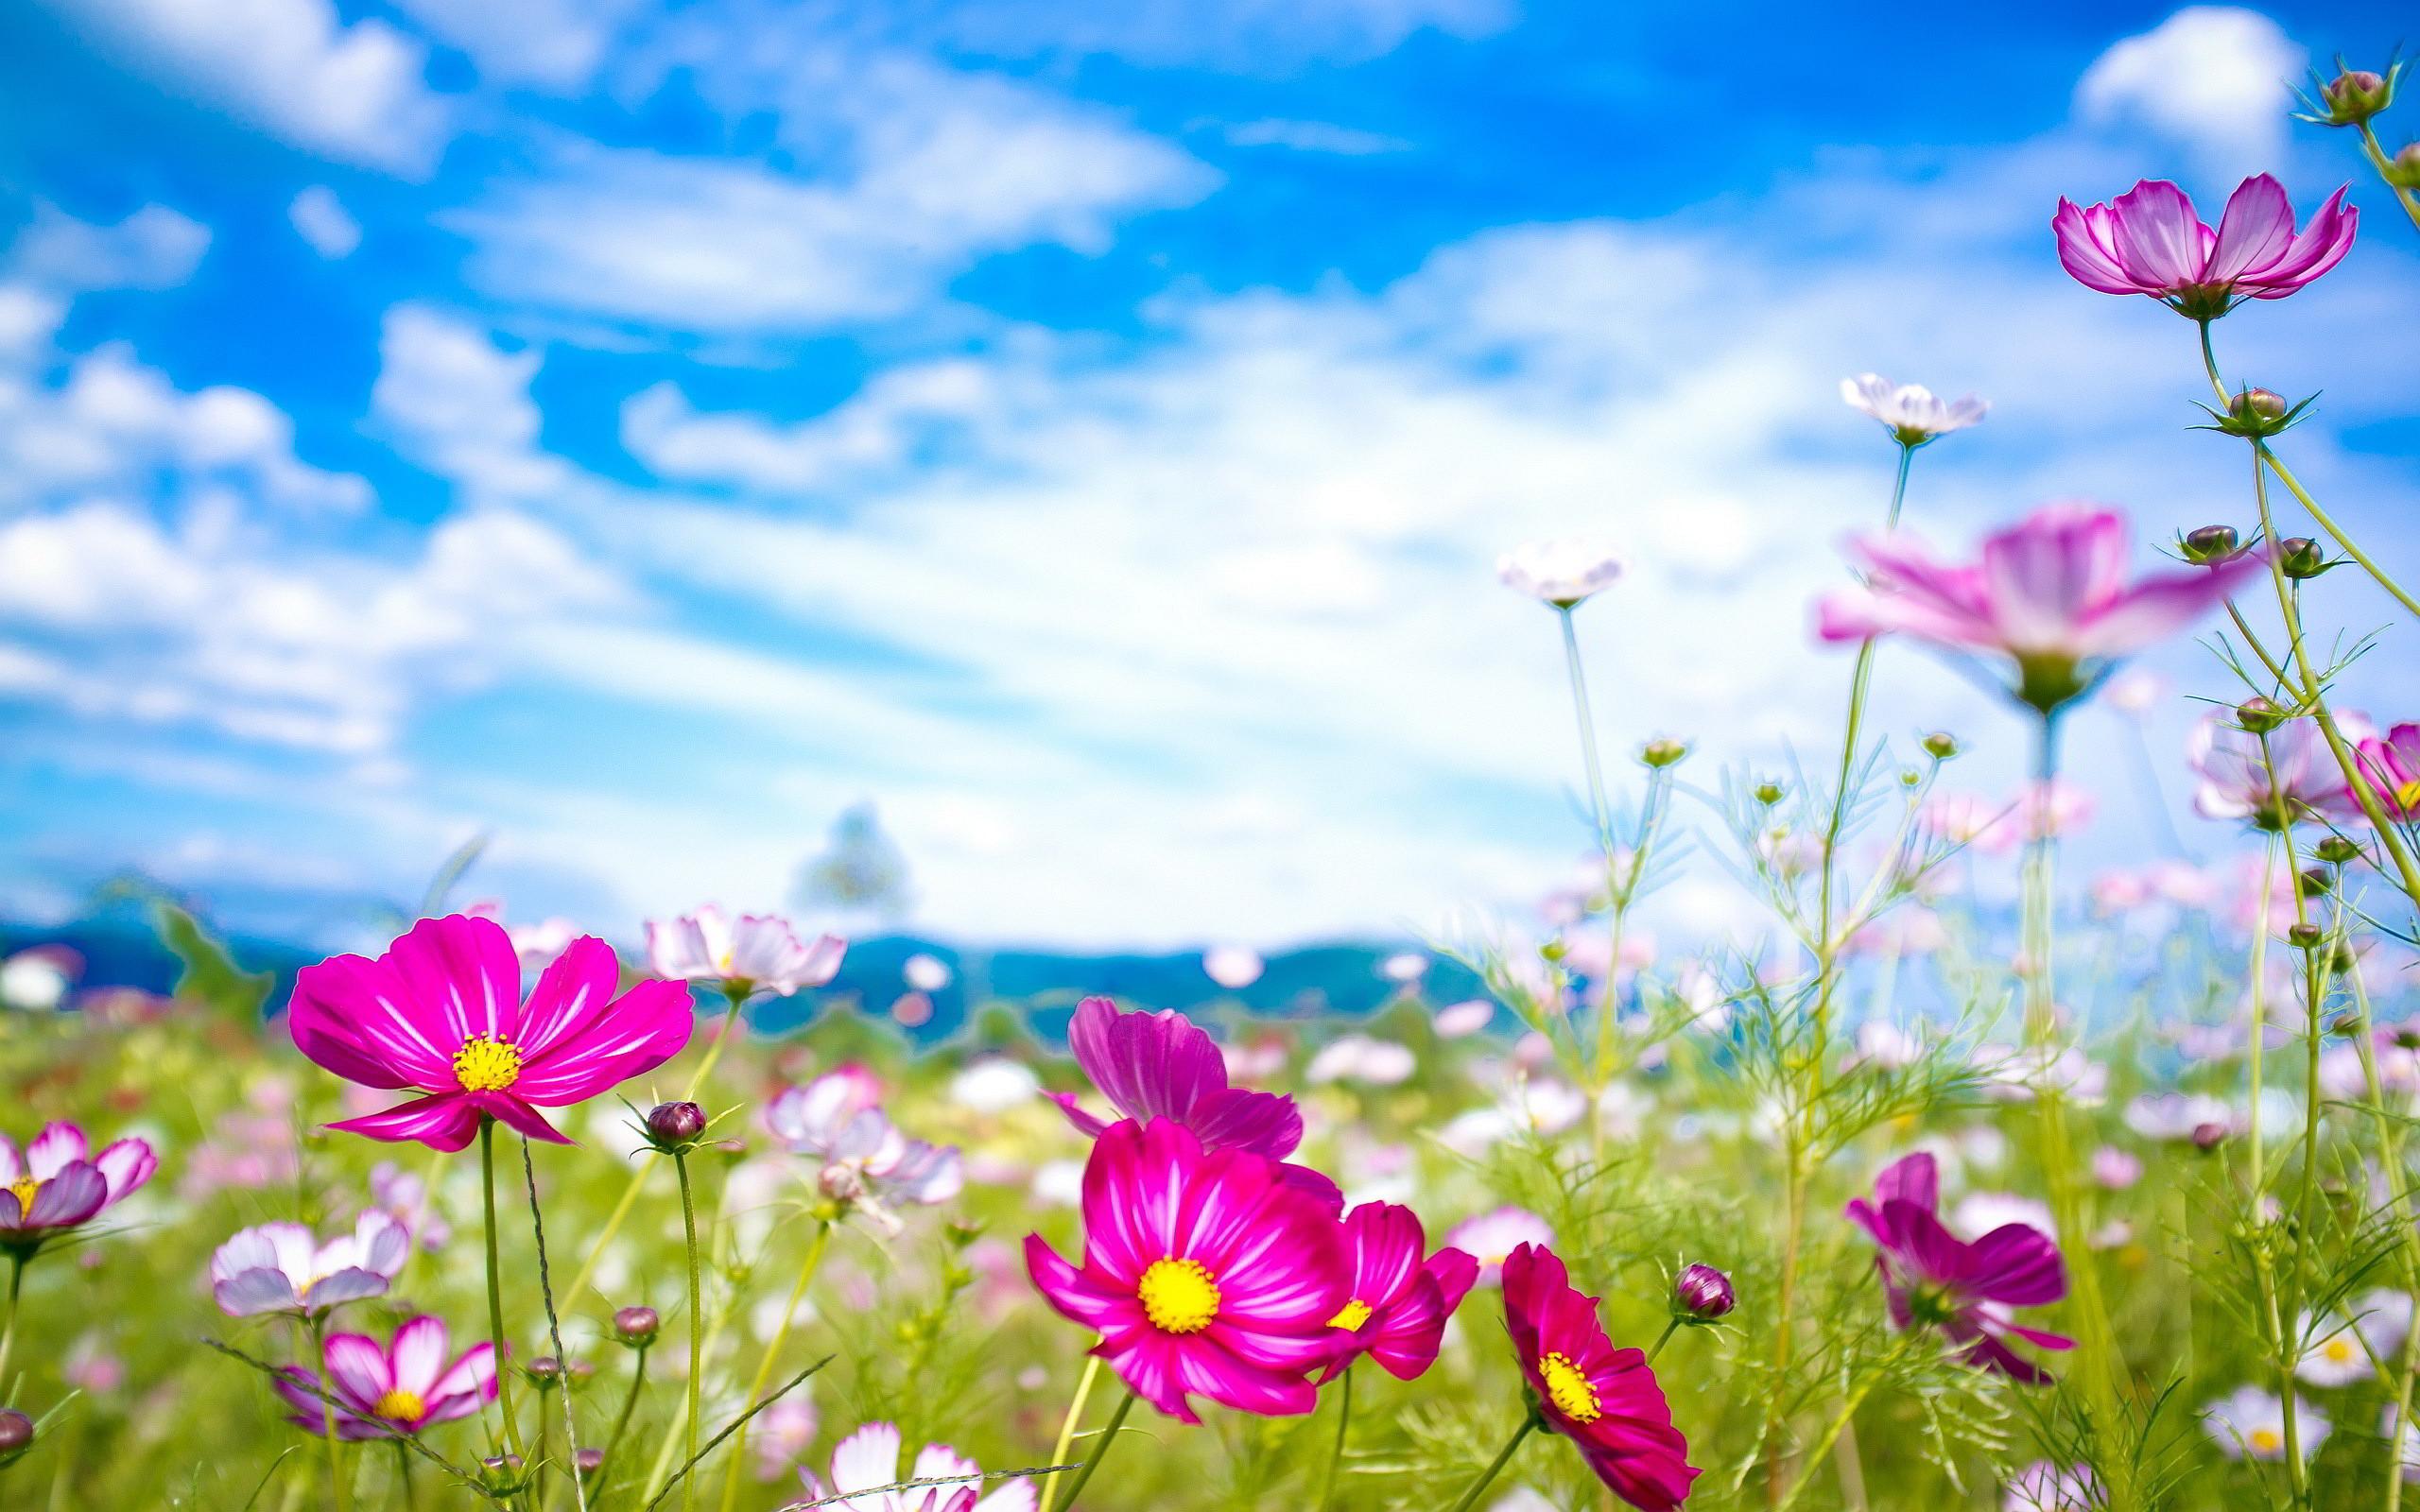 Pink Flowers Summer Wallpaper in